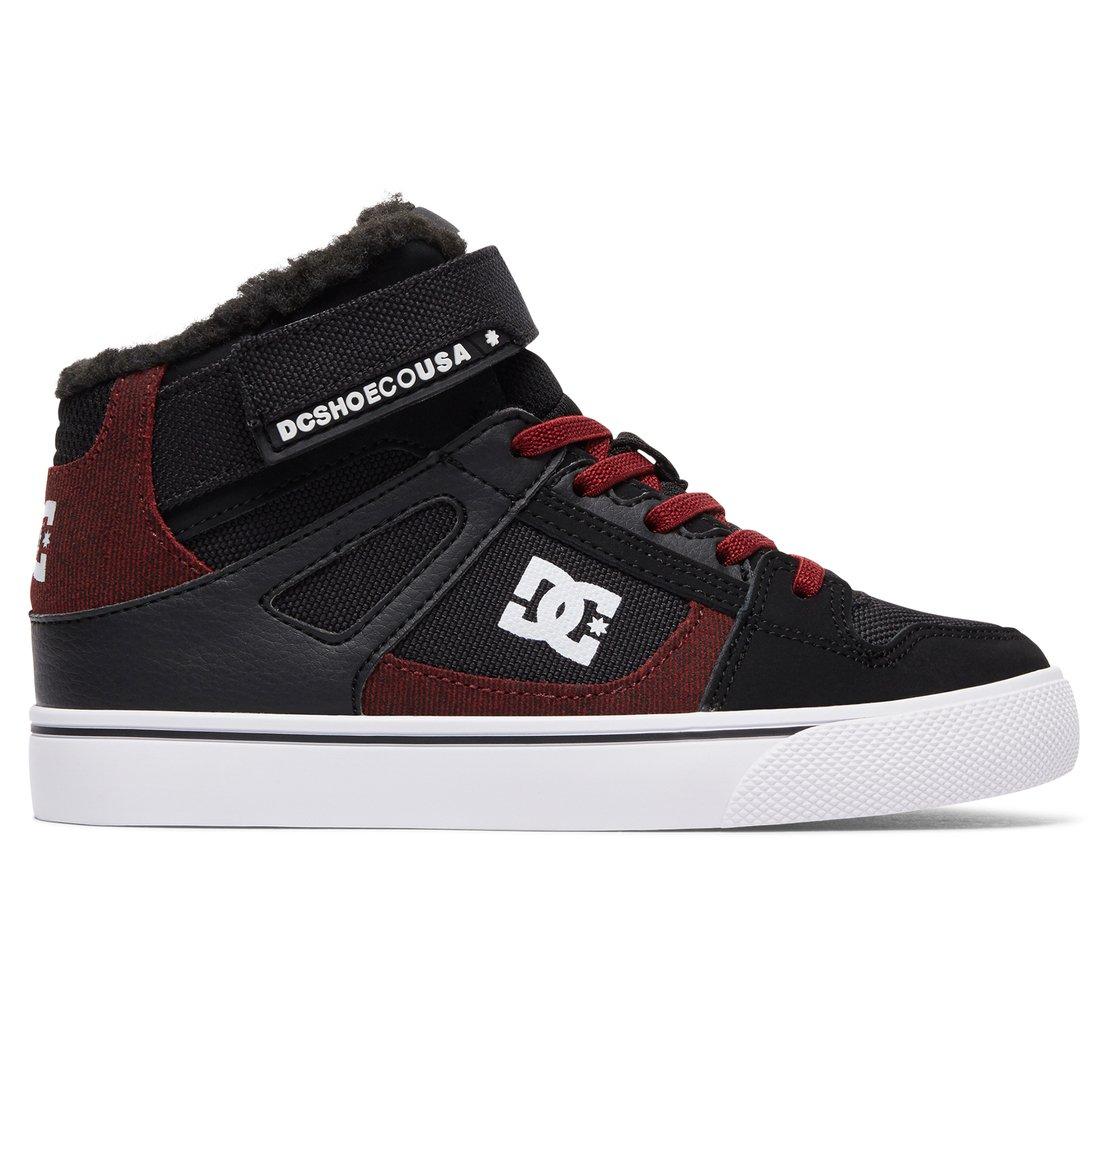 DC Shoes Spartan High WNT EV, Jungen Sneaker, Schwarz (Black/Dark Red), 30 EU (11.5 UK)